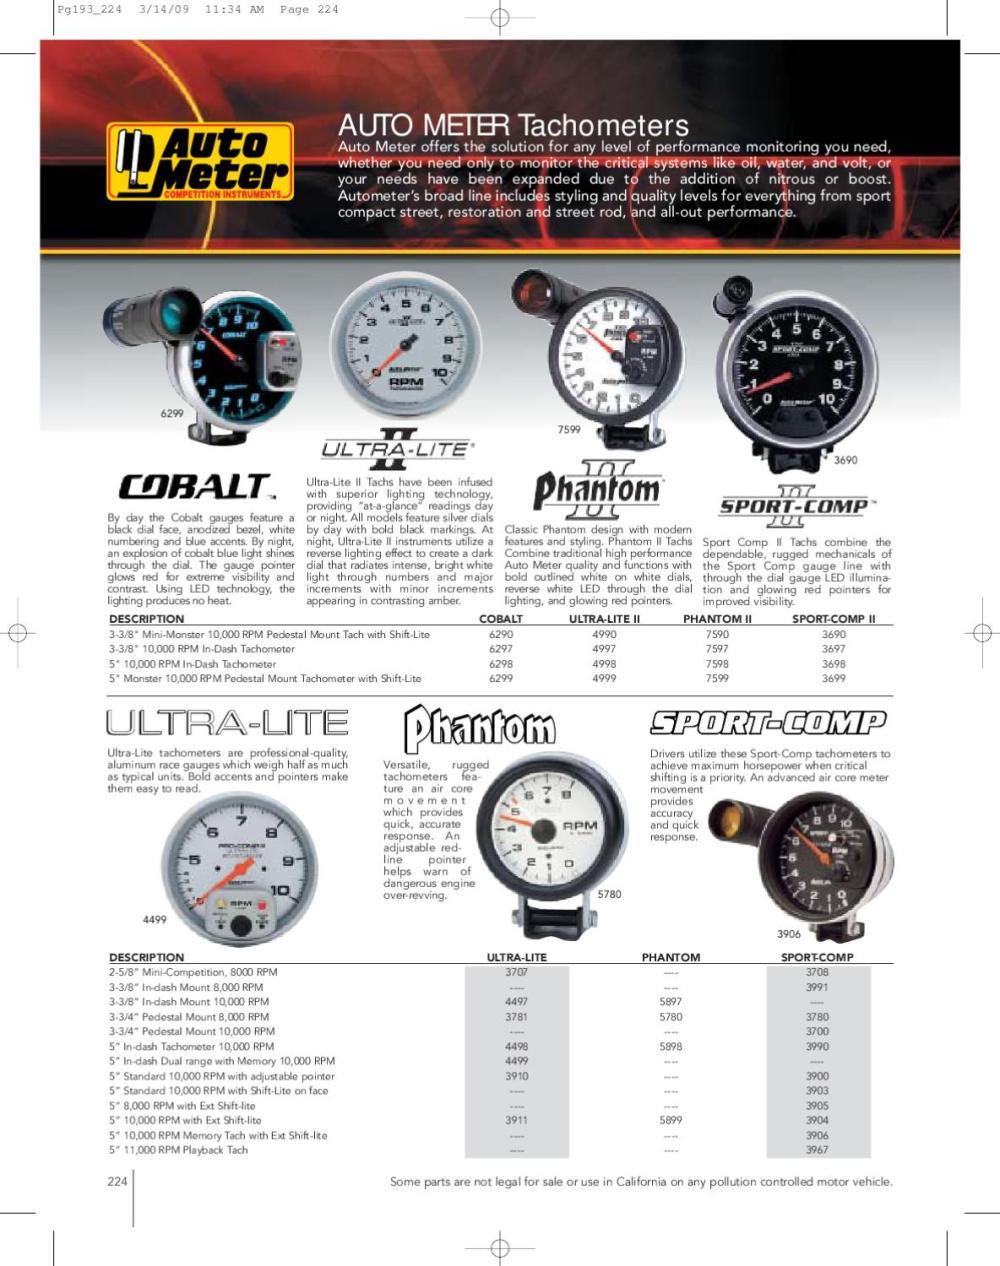 medium resolution of autometer by pbz ab issuu 3900 auto meter sport comp tach wiring diagram